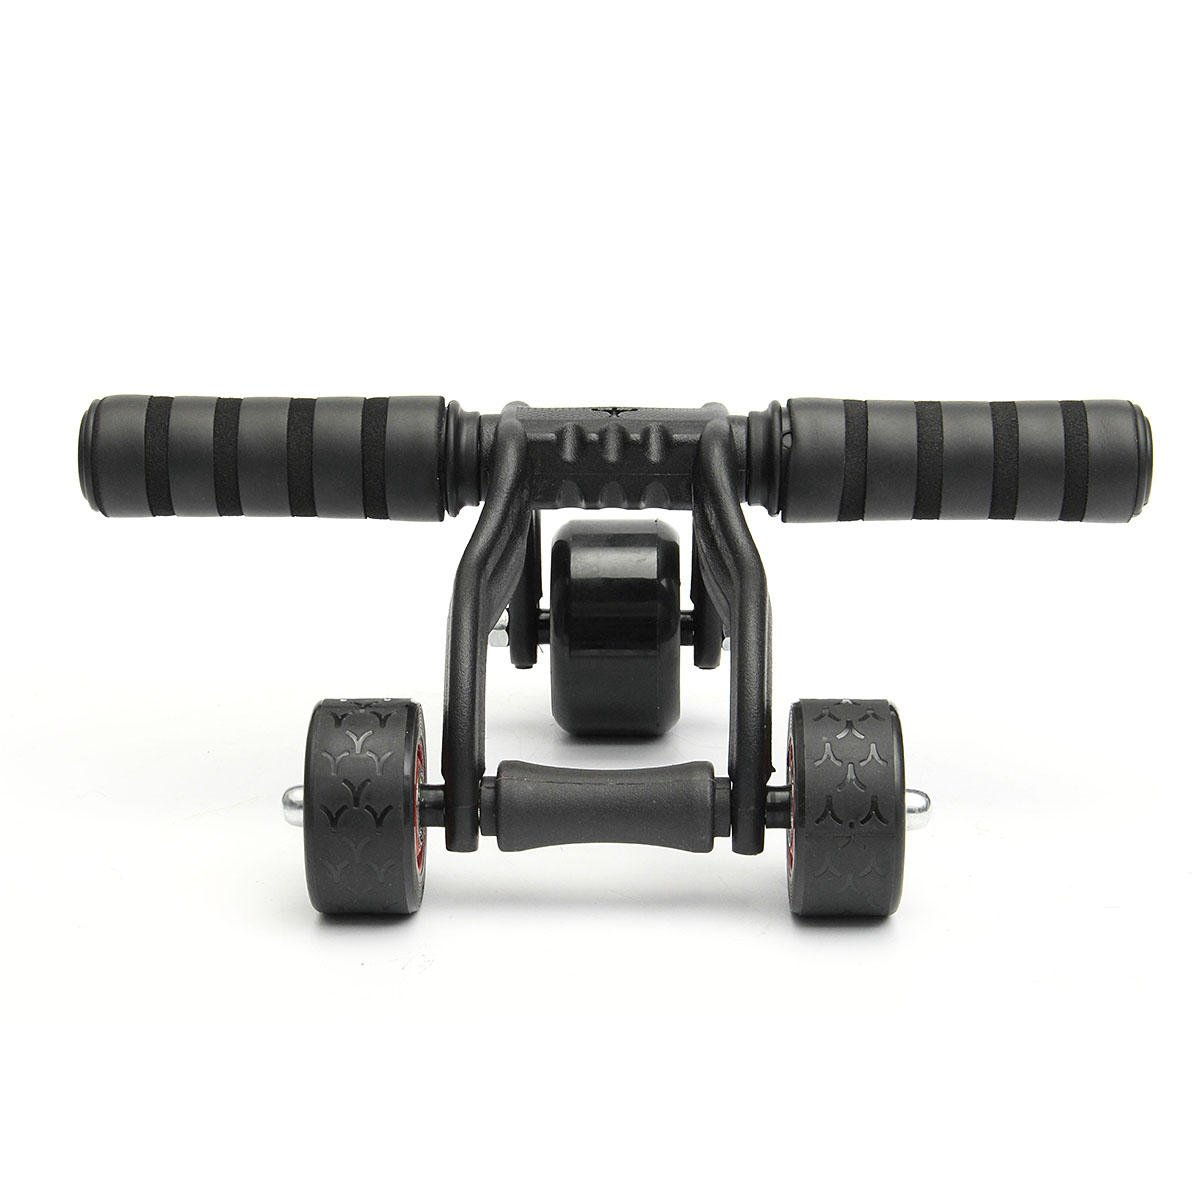 Abdominal Roller Wheel -Abdominal Wheel Ab Roller - 3 Wheels Abdominal Roller Ab Muscle Fitness Workout Training System Gym Exerciser (Abdominal Roller Wheel New)